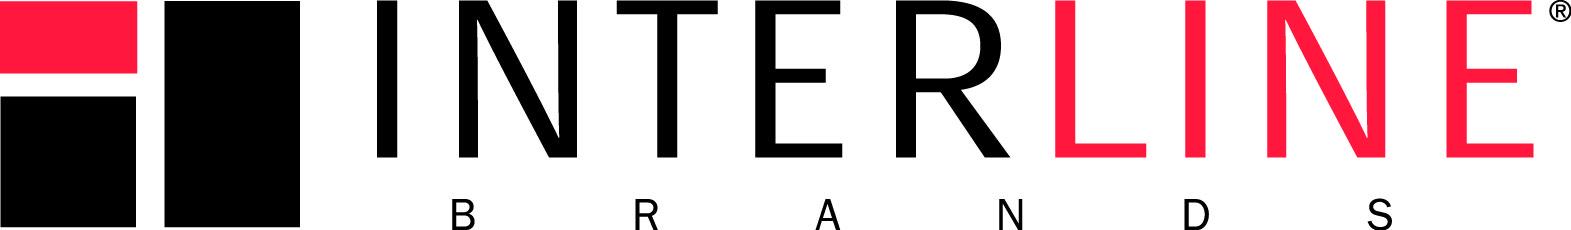 Interline_Brands_Logo